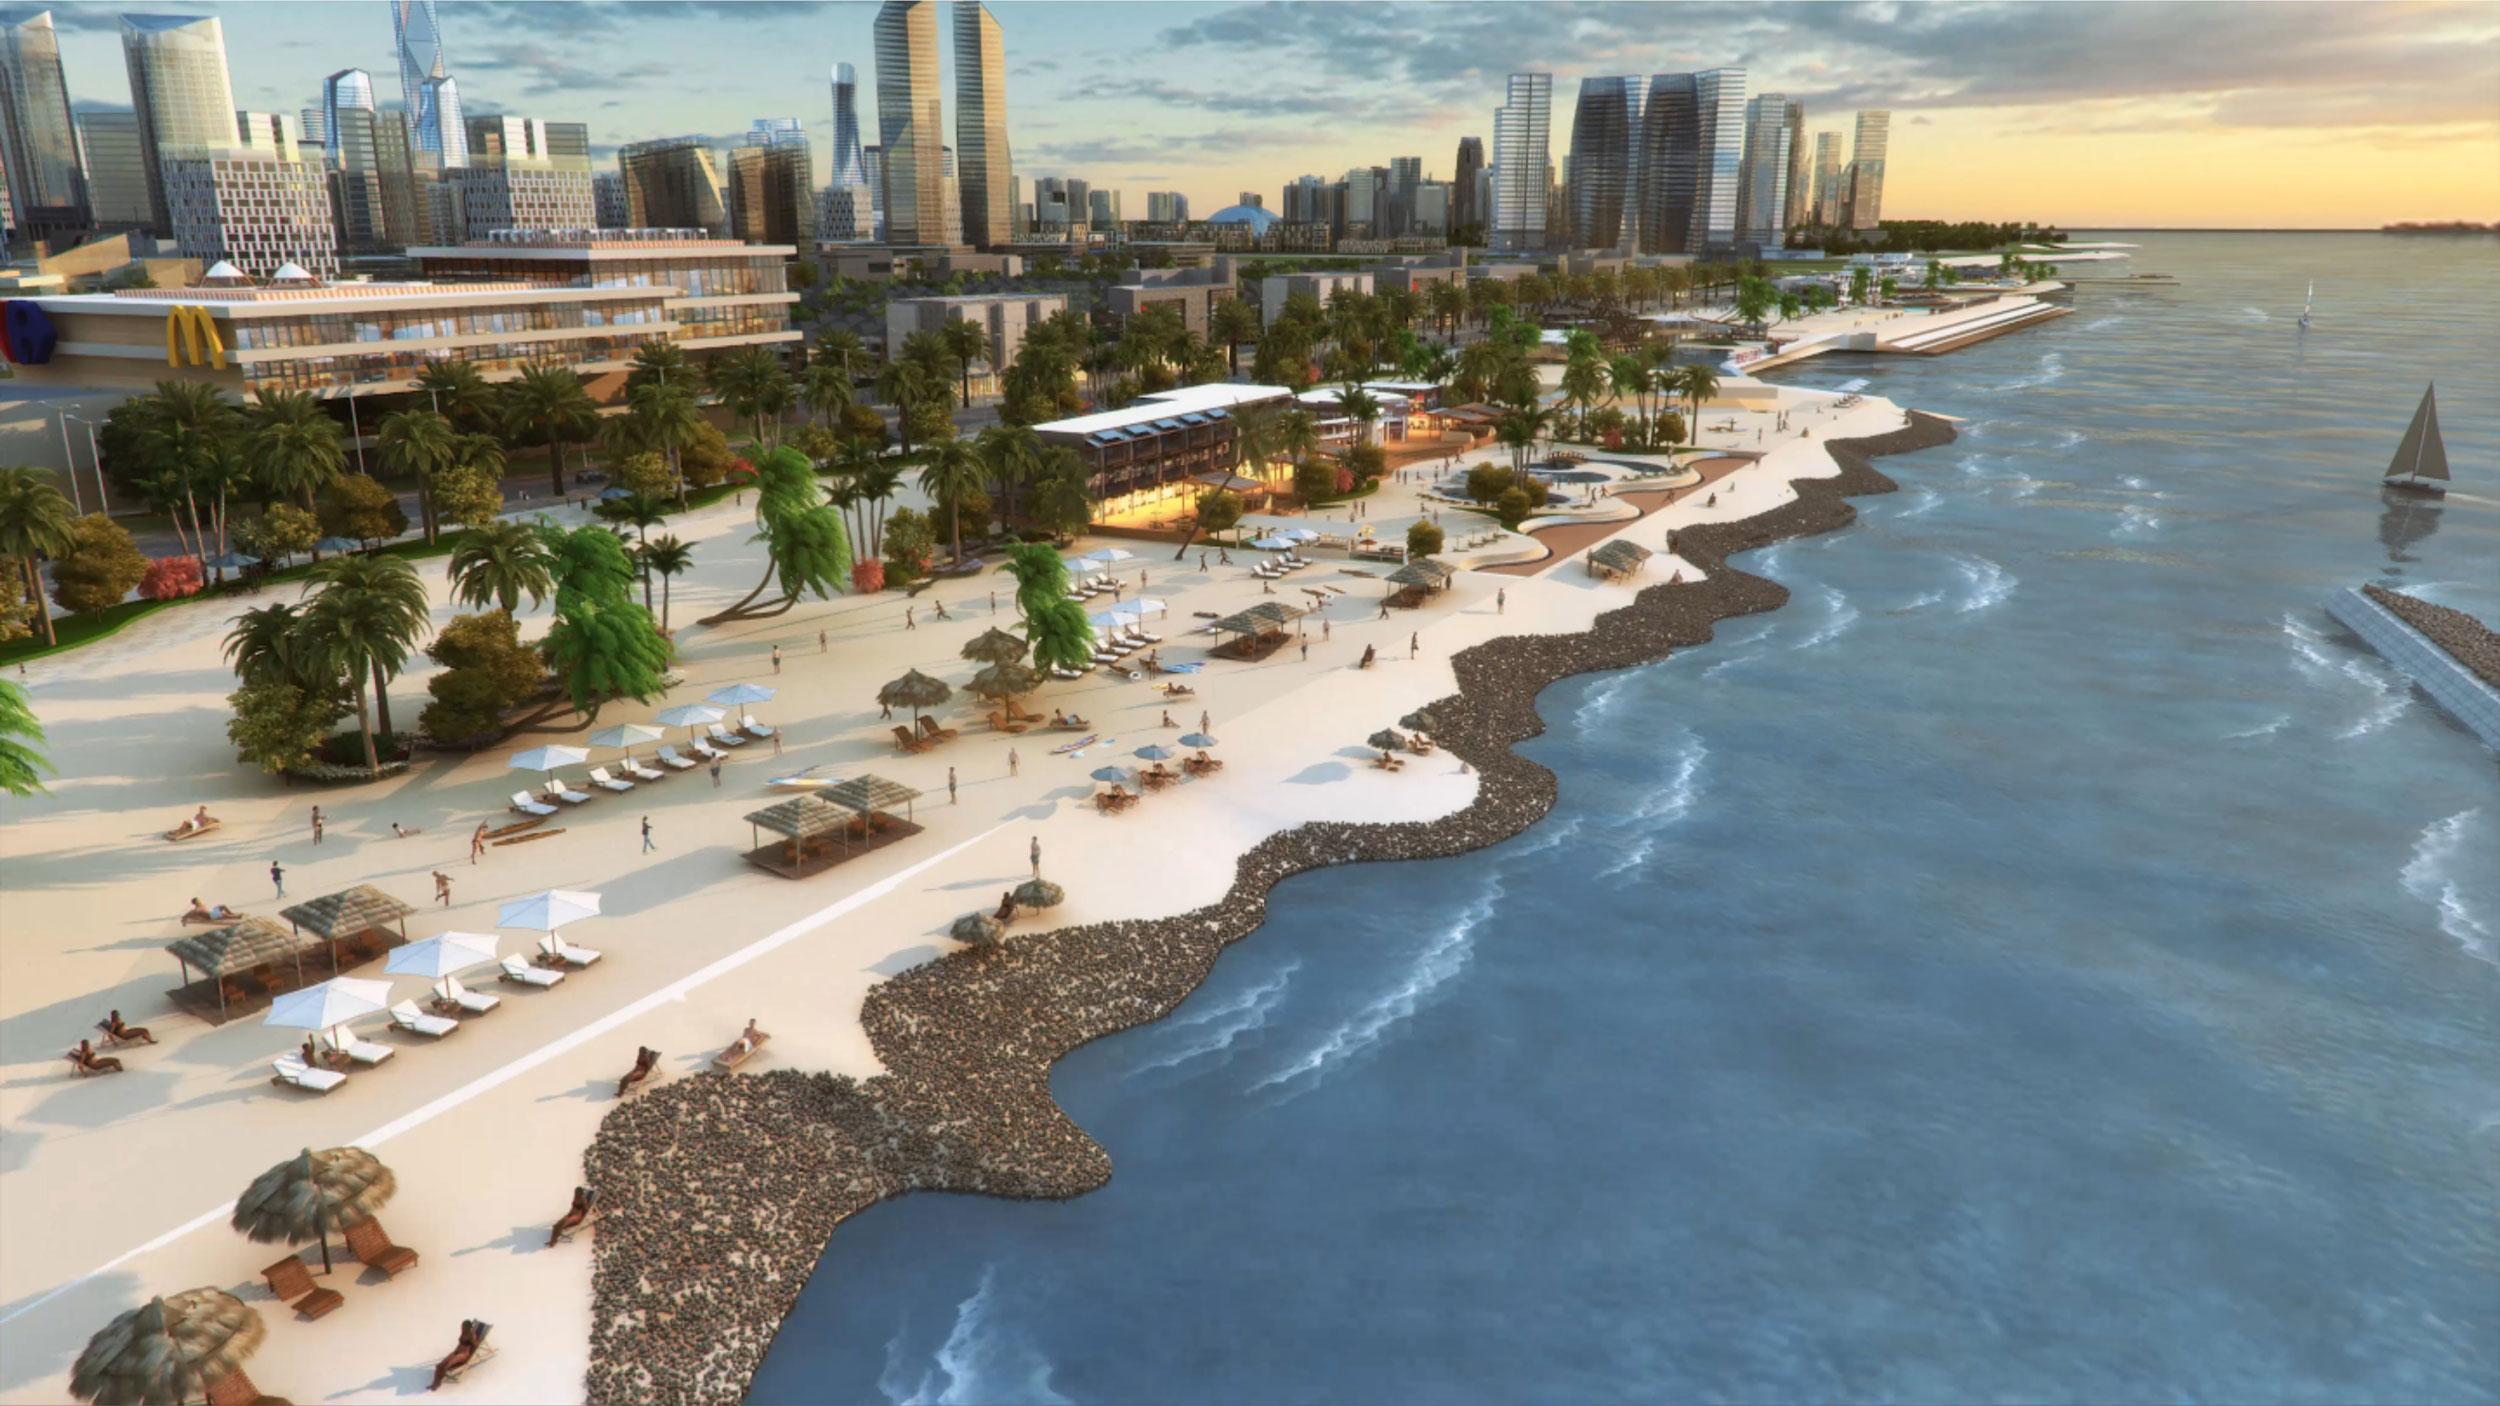 Pik2 Facilities - Waterfront